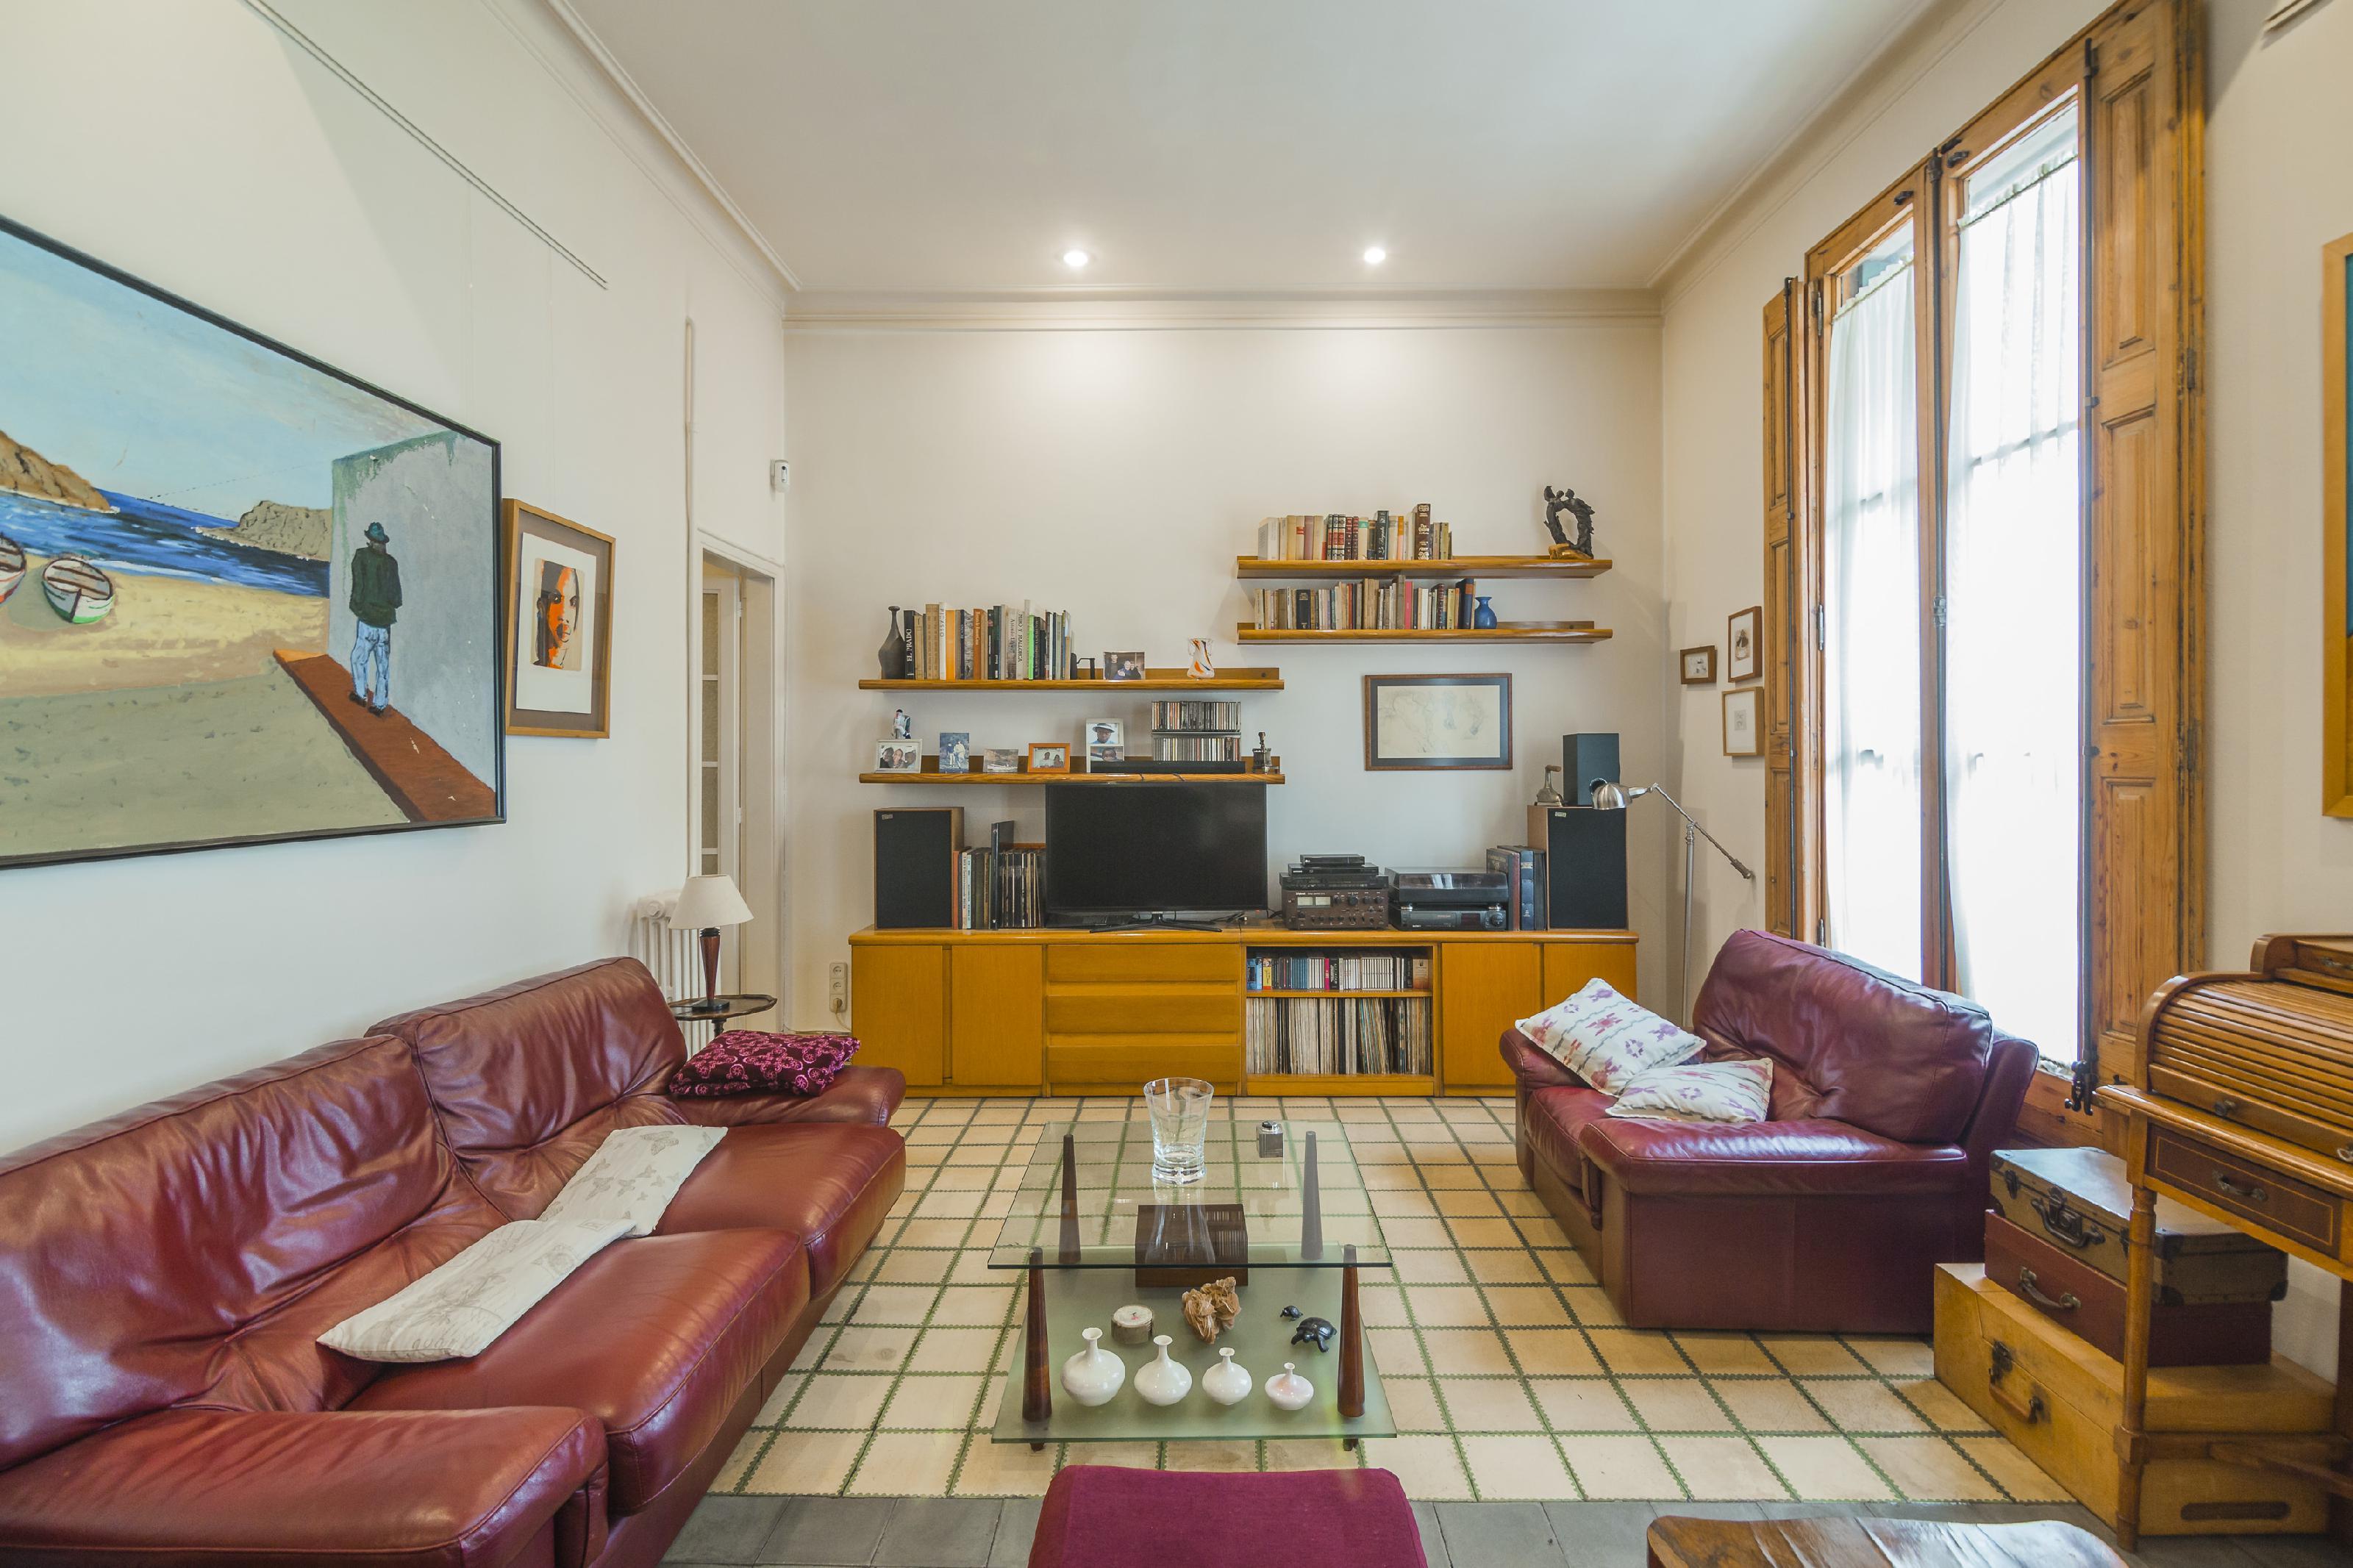 250020 Piso en venda en Gràcia, Vila de Gràcia 8